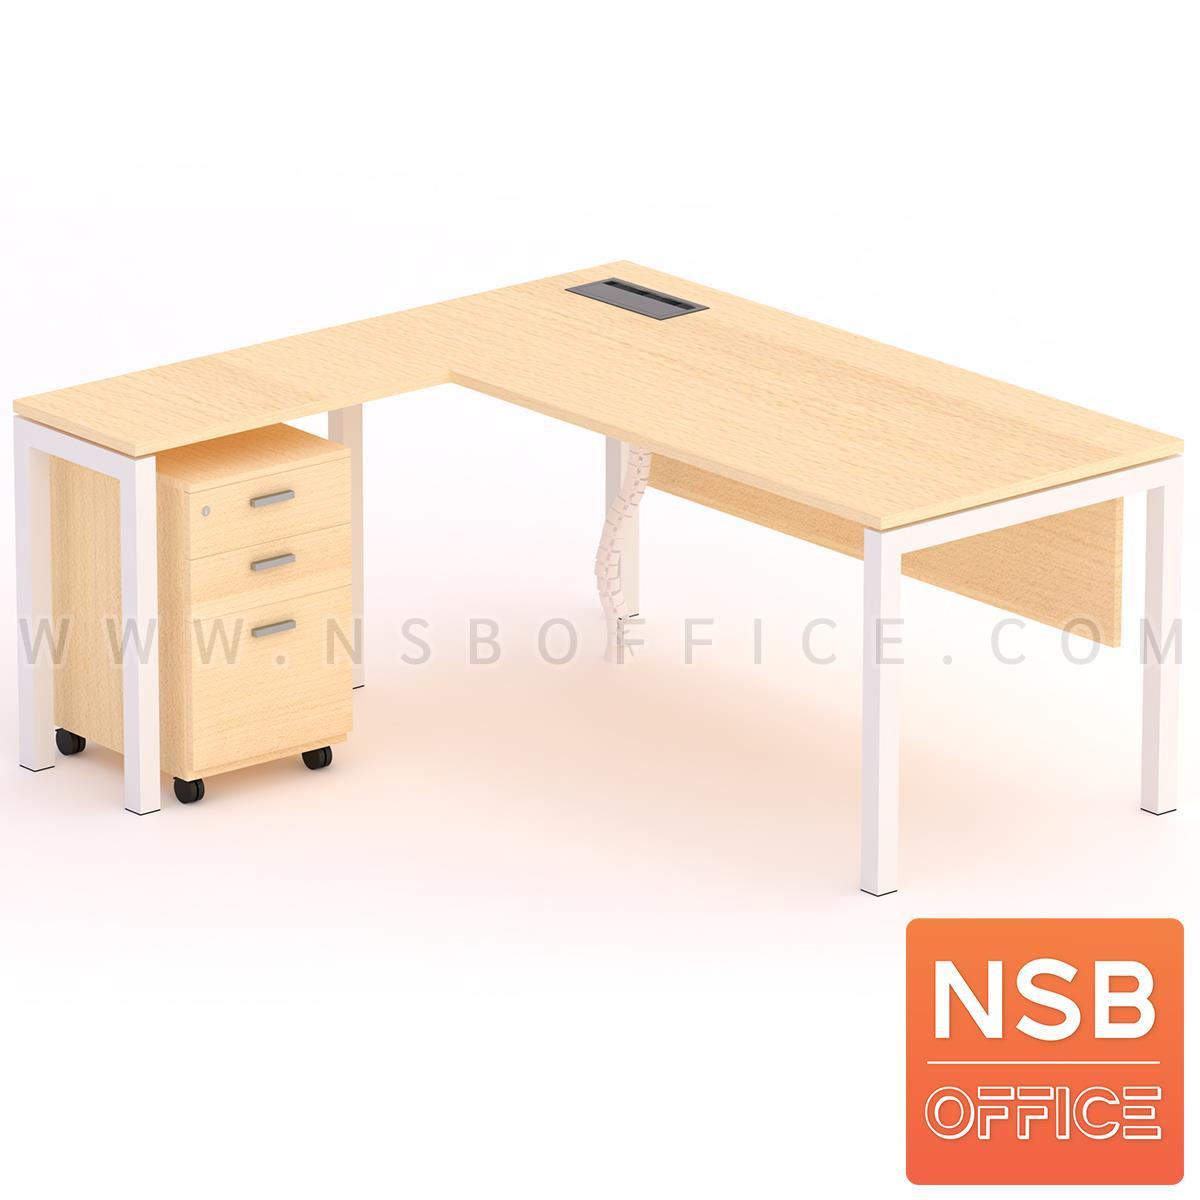 A30A036:โต๊ะผู้บริหารตัวแอล ตู้ข้างล้อเลื่อน รุ่น Max steel (แม็กซ์สตีล) ขนาด 180W cm. รางไฟใต้โต๊ะ